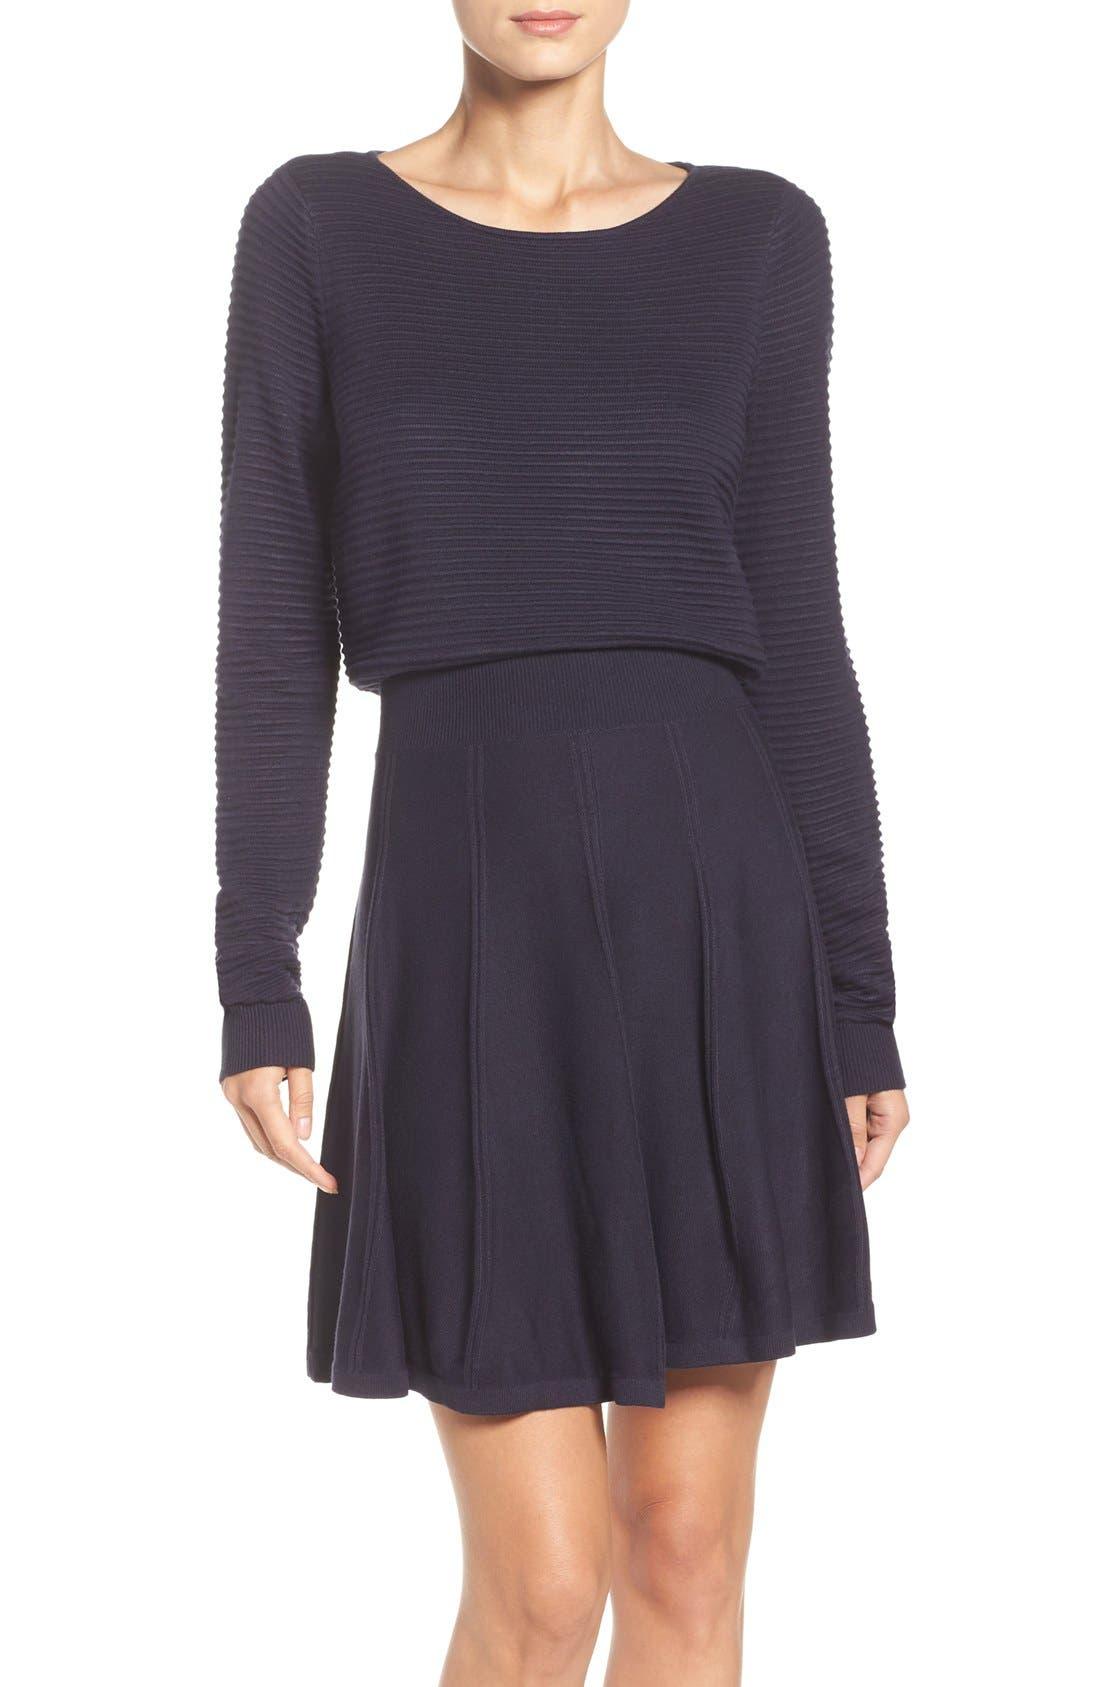 Alternate Image 1 Selected - Eliza J Sweater Fit & Flare Dress